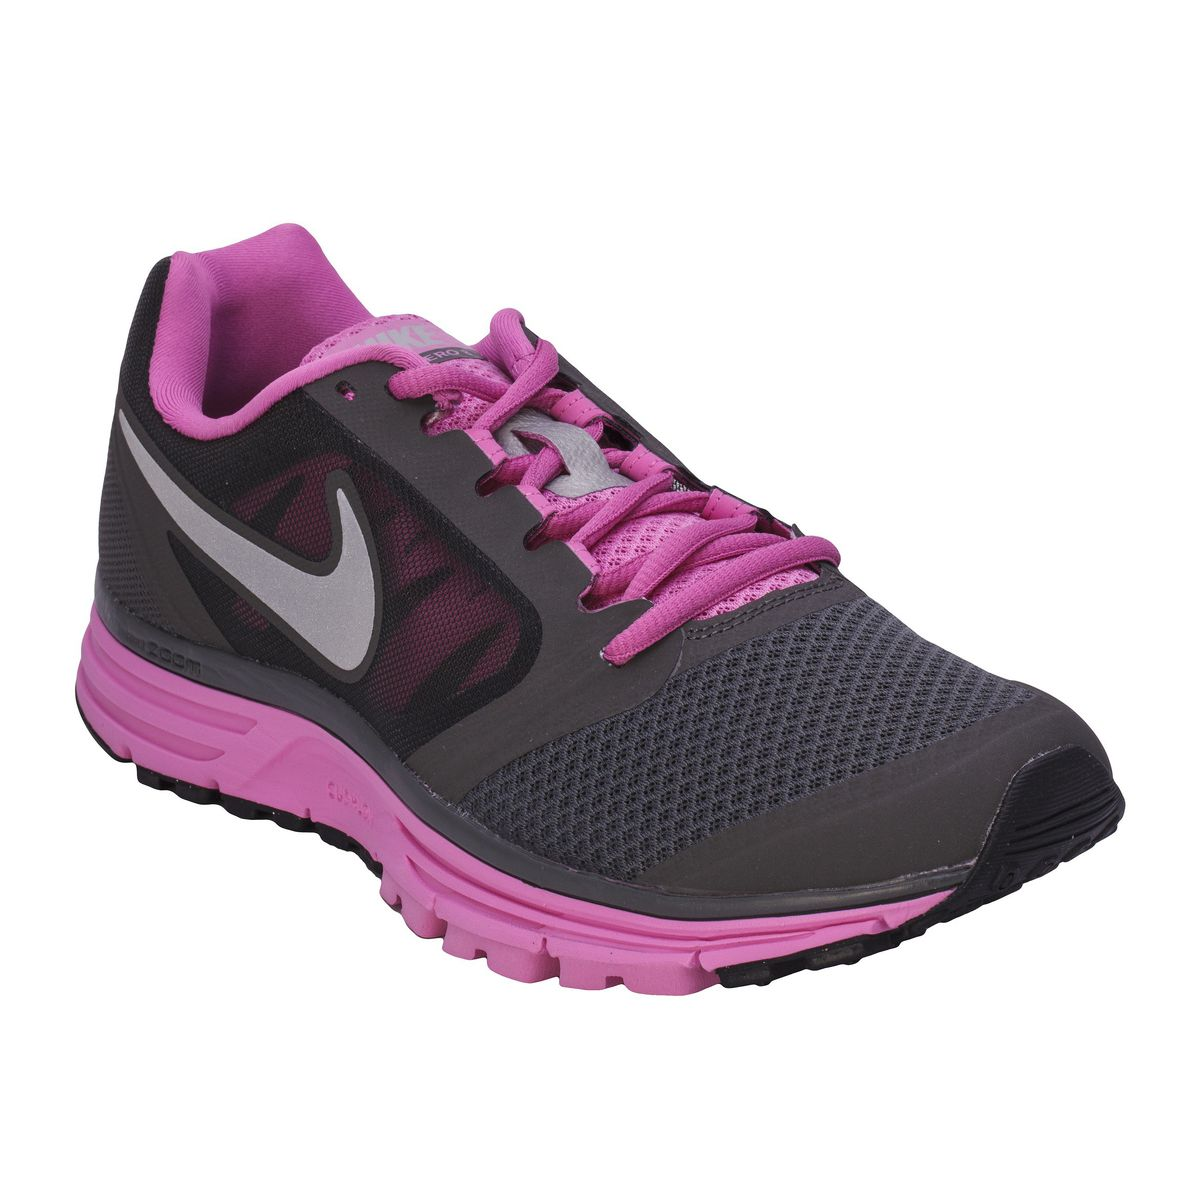 f0b2fefa6472f ... Mens Nike Air Zoom Vomero 11 Running Shoes Womens Nike Zoom Vomero+ 8 Running  Shoe.